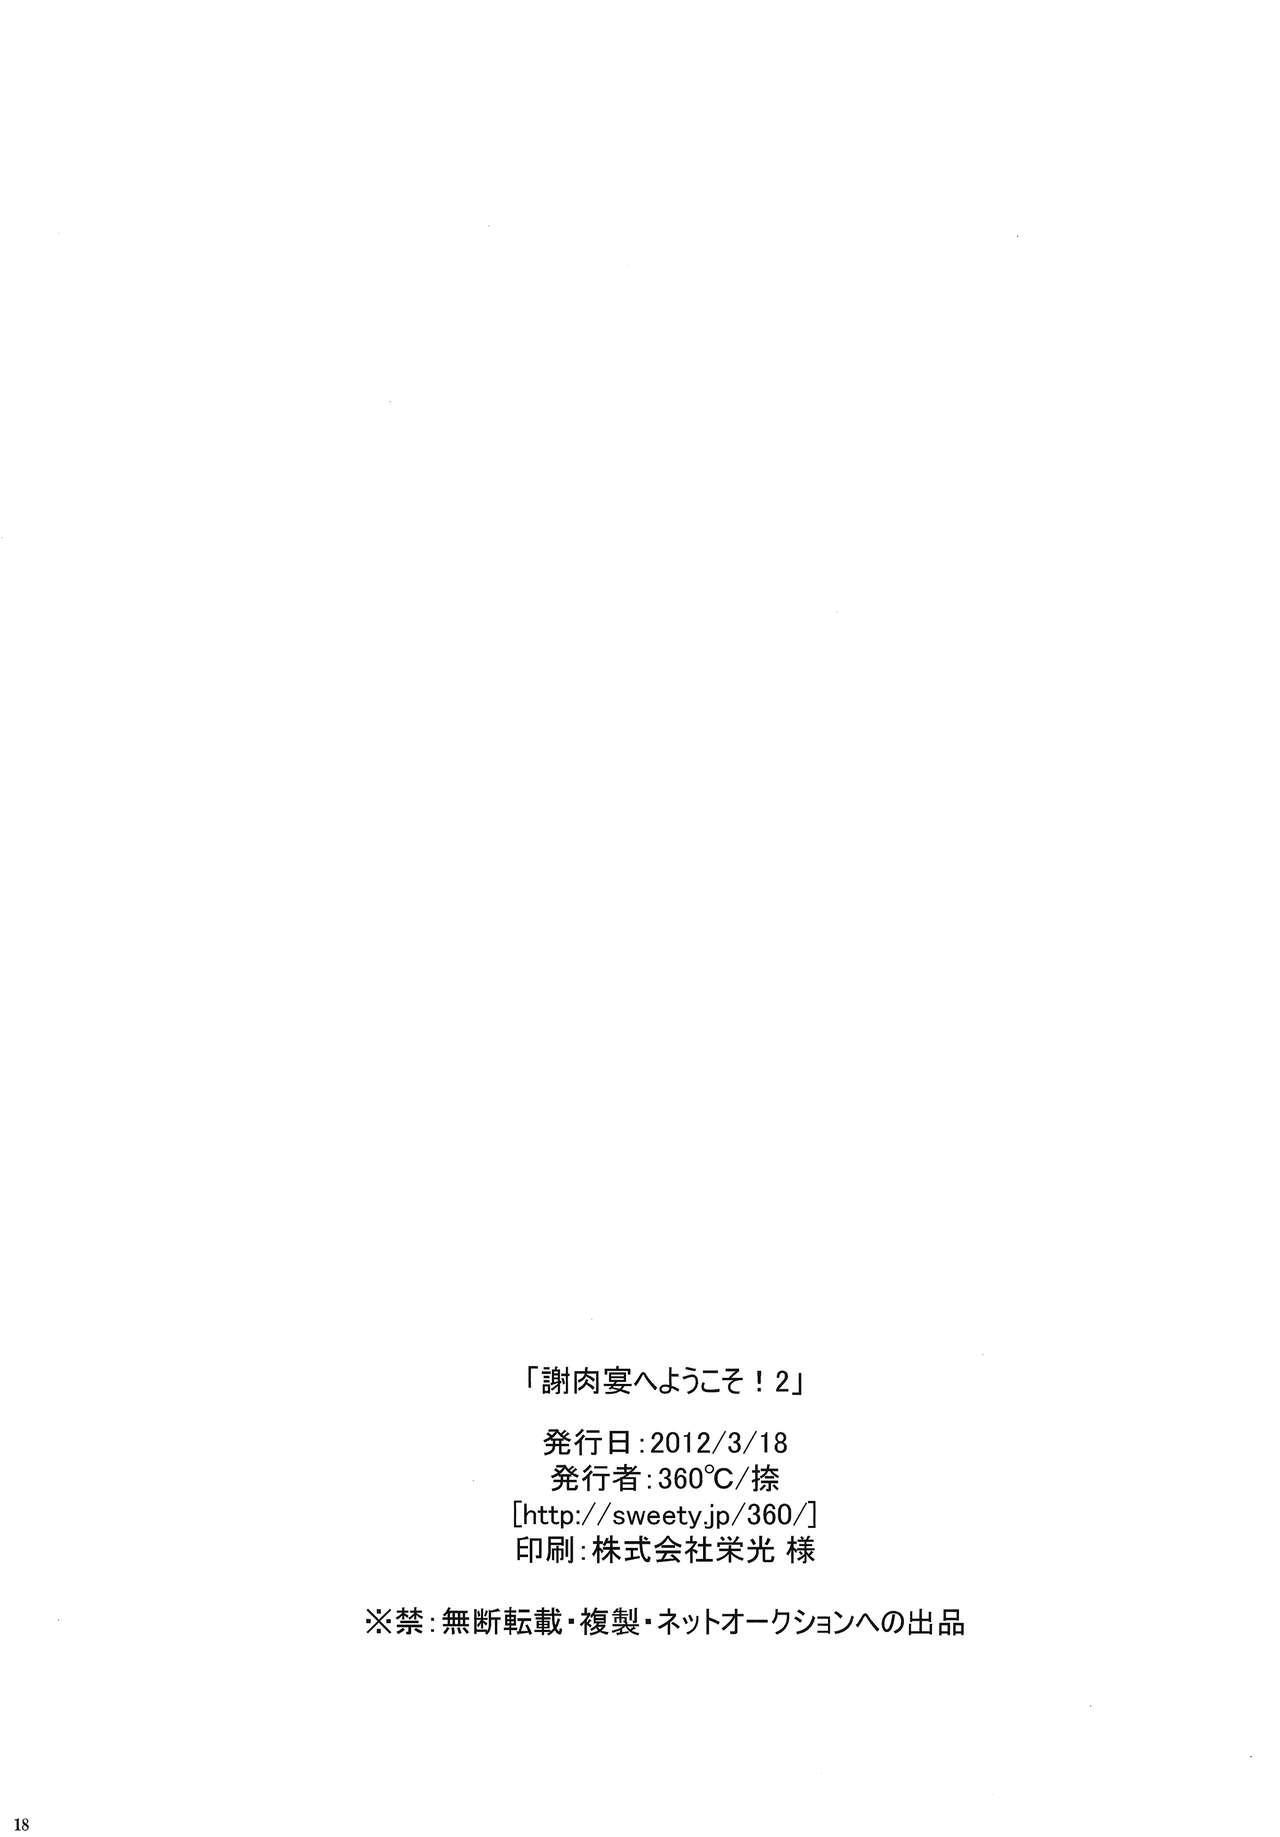 [360°C (Natsu)] Shanikuen e youkoso! 2 -Judal-chan ga Onnanoko na Hon 2.5-   Welcome to the Festival! 2 ~A book where Judal is a girl 2.5~ (Magi: The Labyrinth of Magic) [English] 16